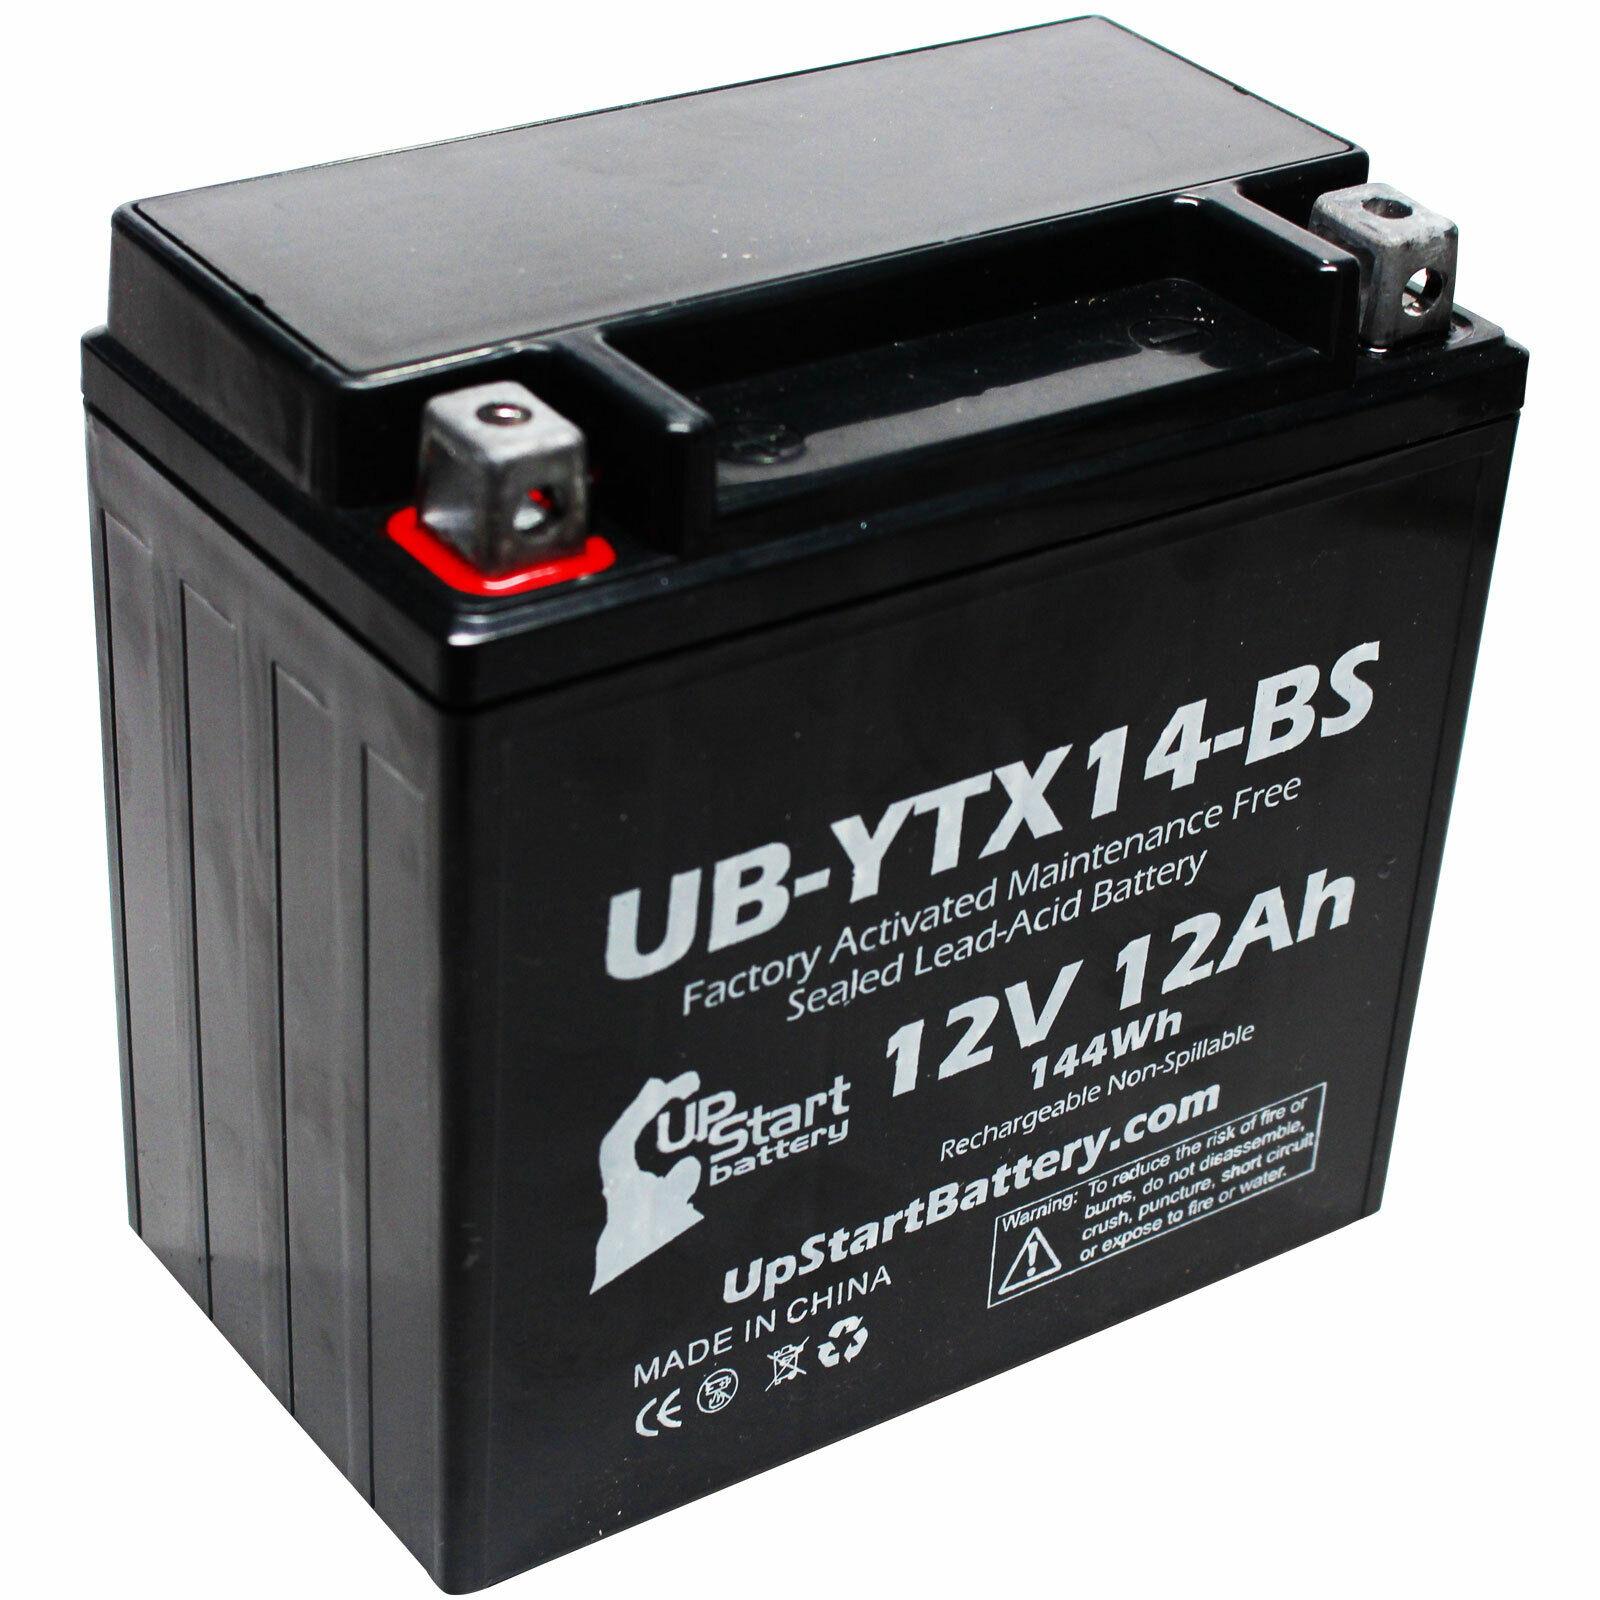 12V 12AH Battery for 2005 Honda TRX350 Rancher 350 CC